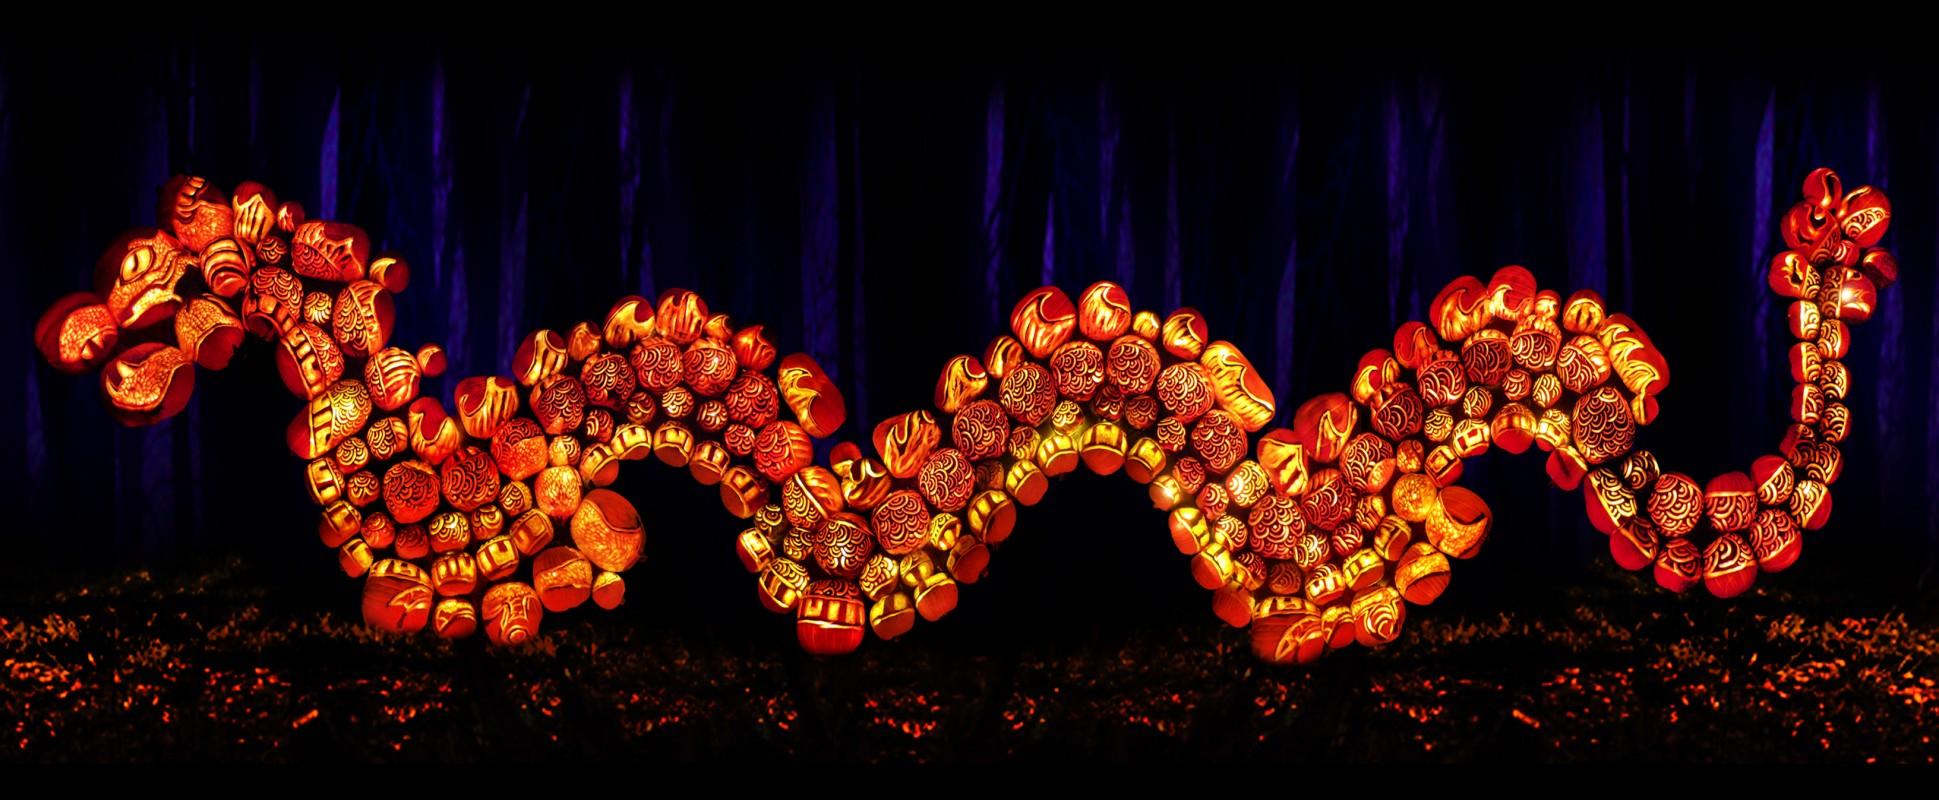 rise of the jack o u0027 lanterns comes to boston this halloween